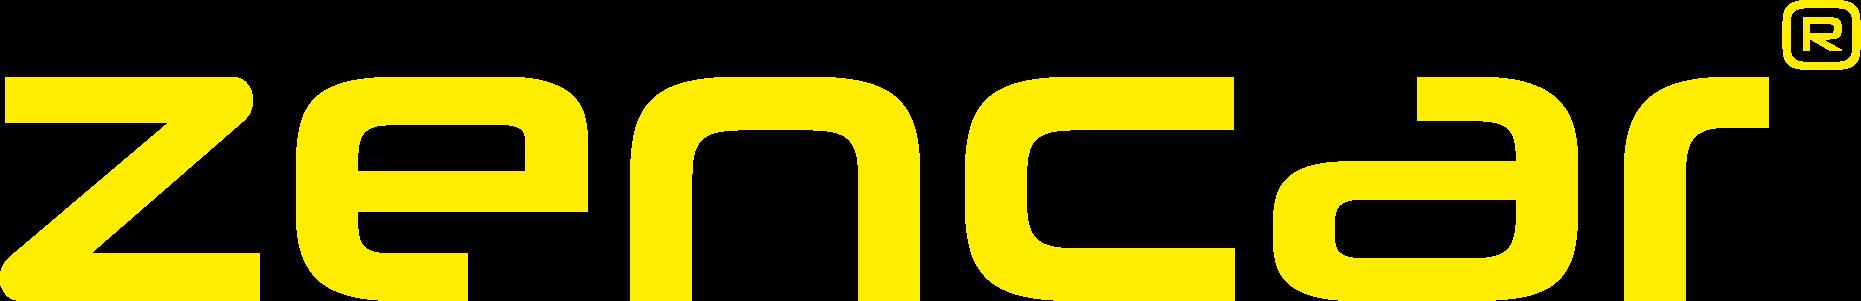 zencar logo